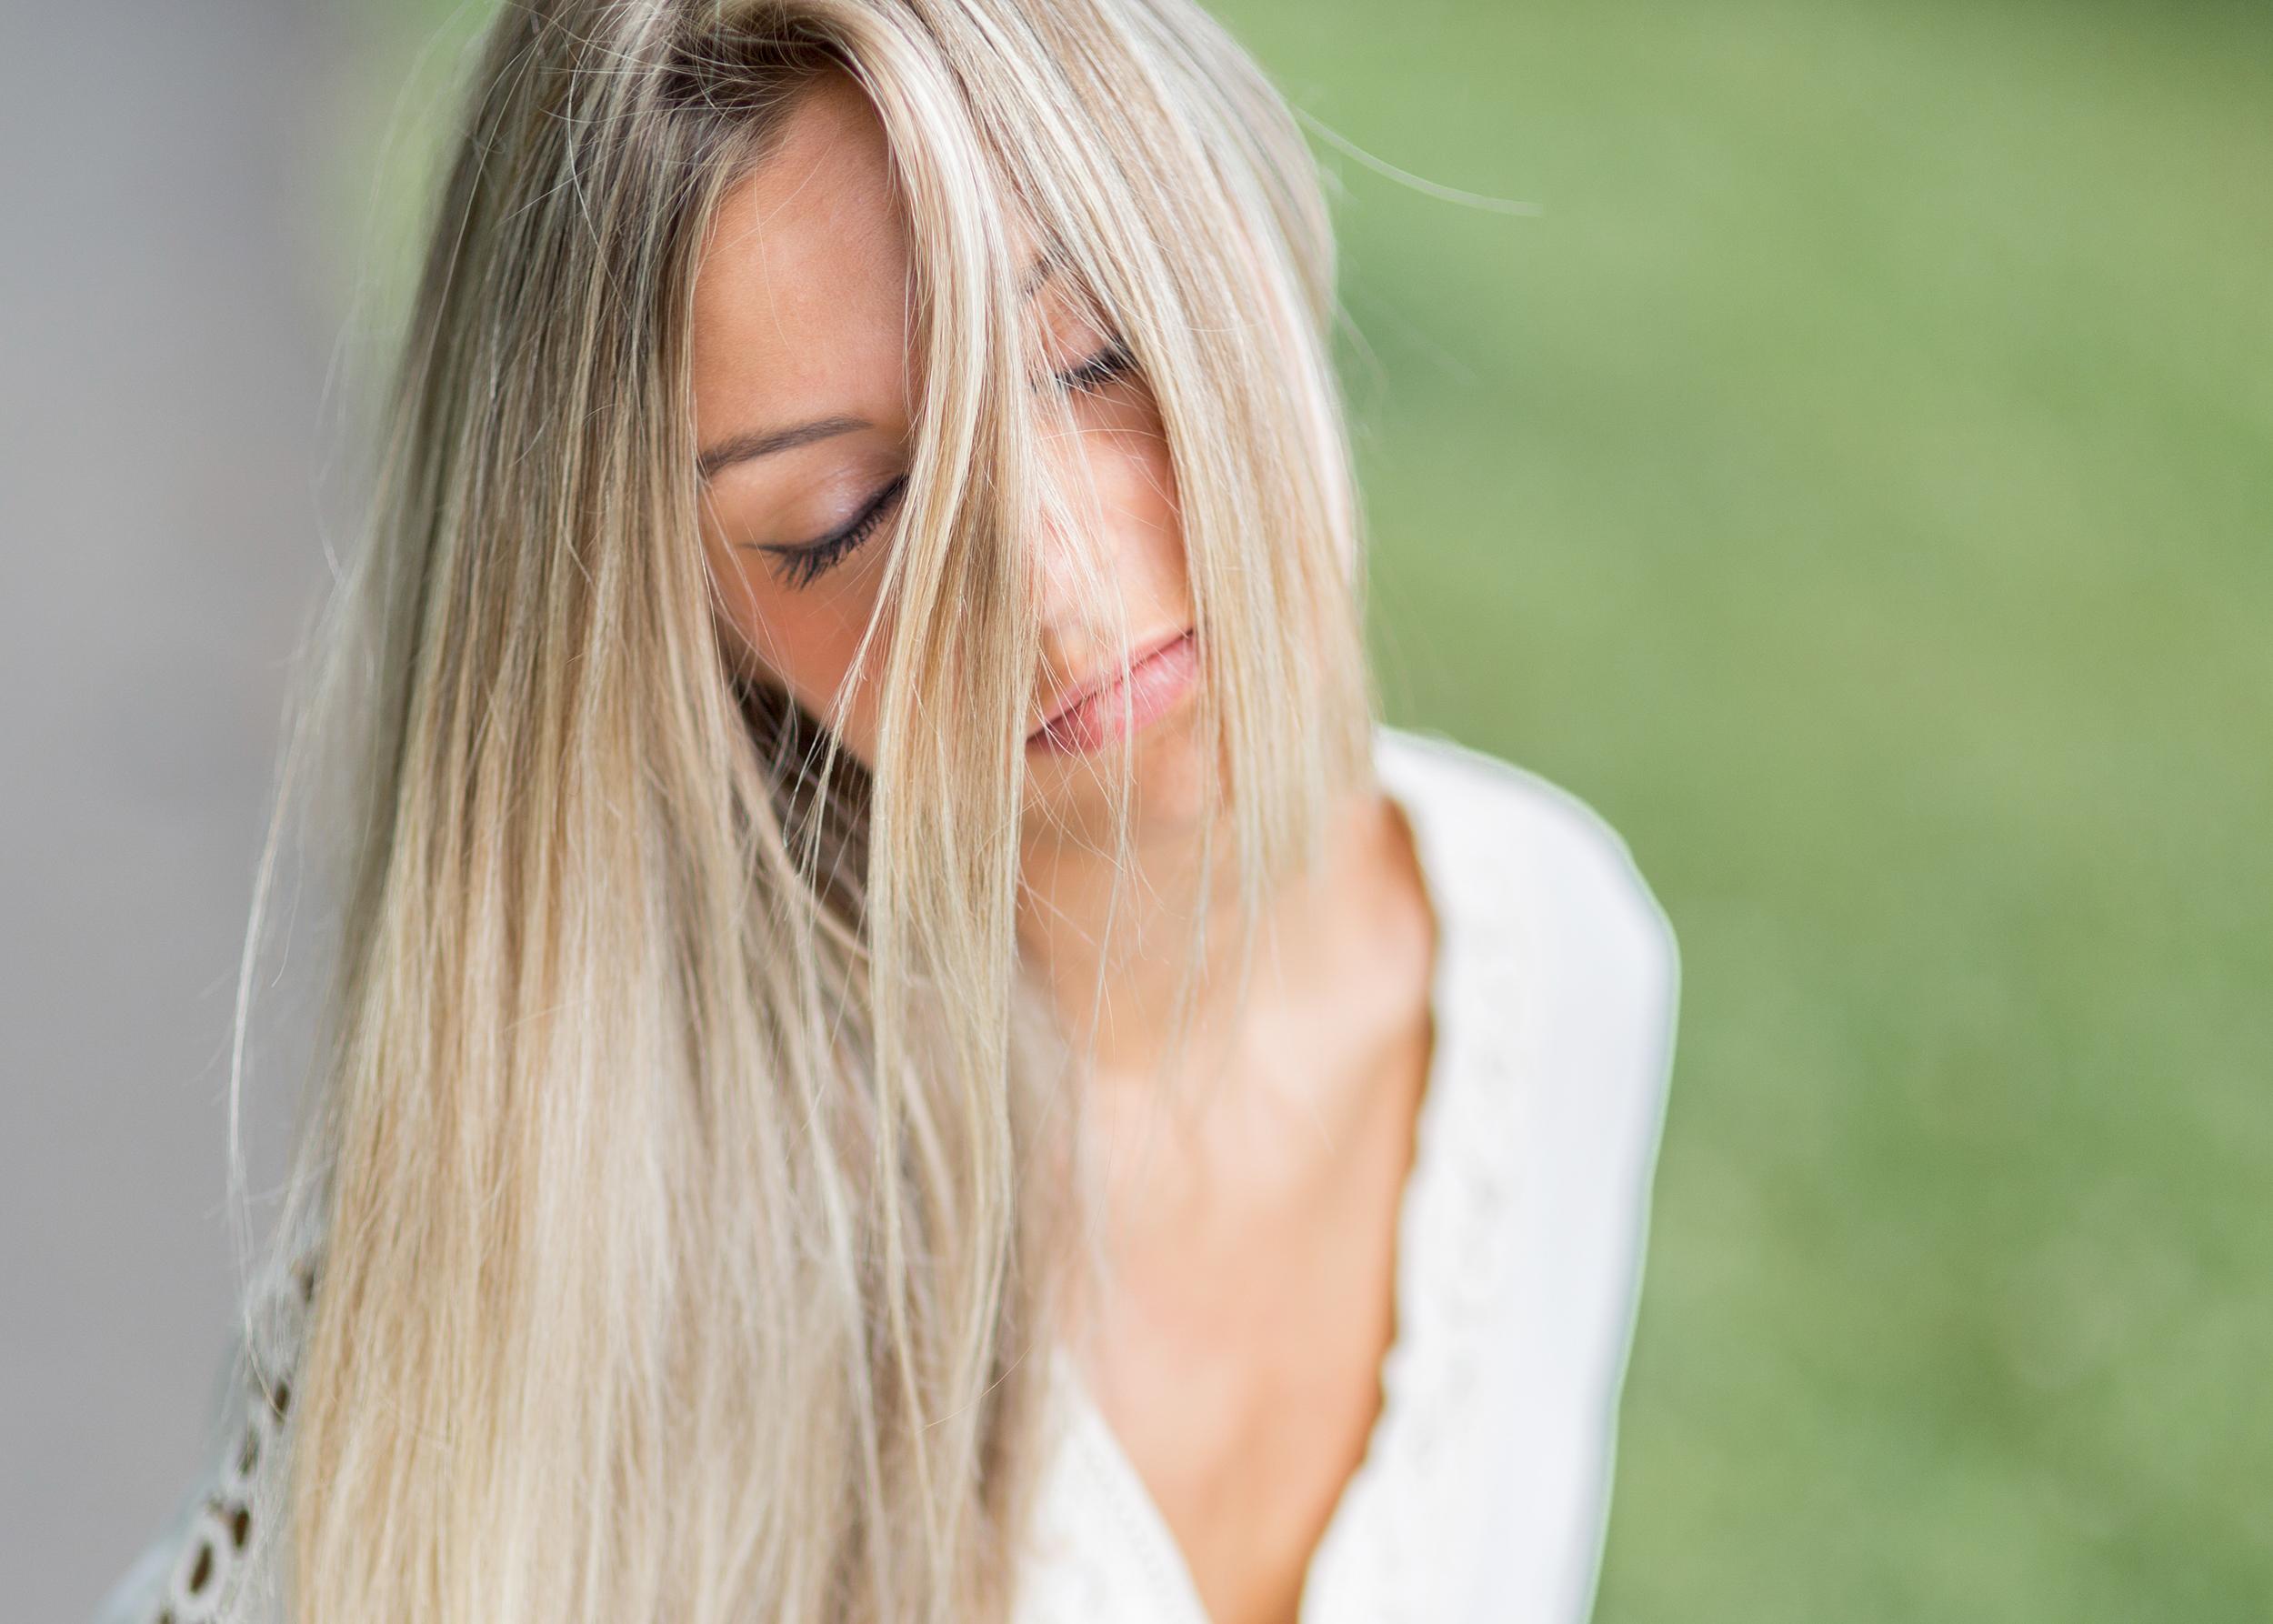 Manon Rodriguez blonde Lacher prise